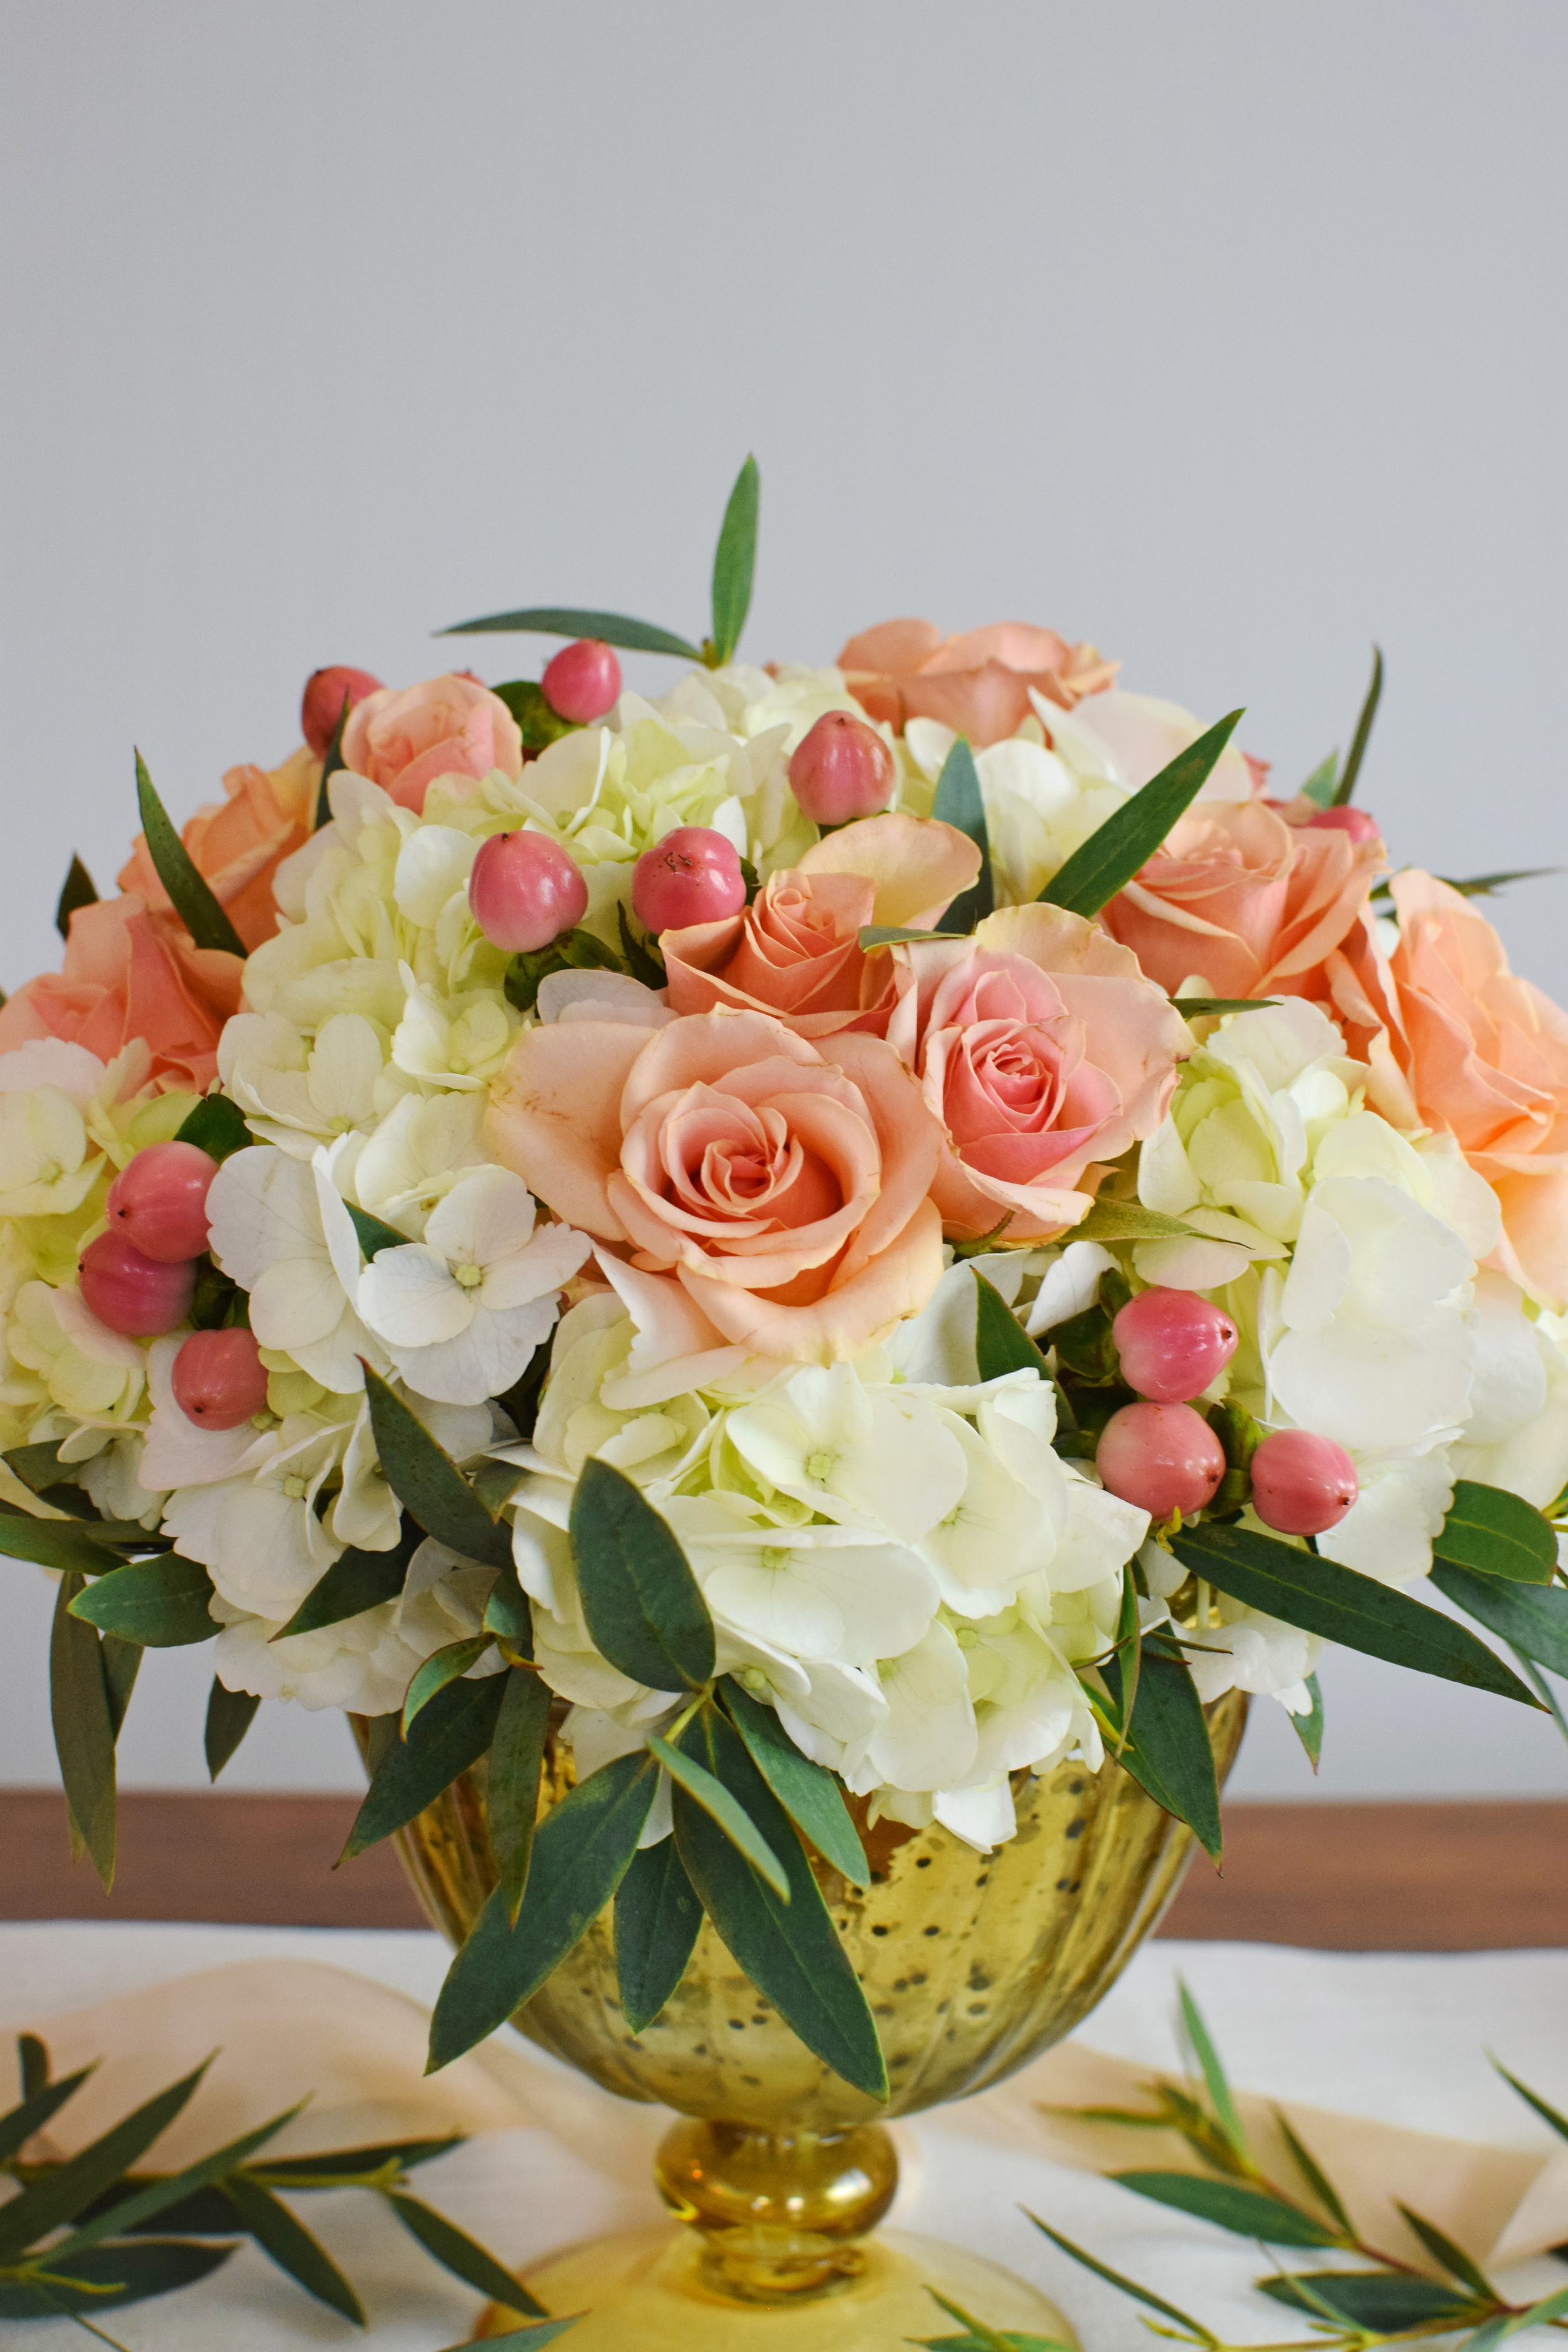 FlowerMoxiediybide_peach13.jpg